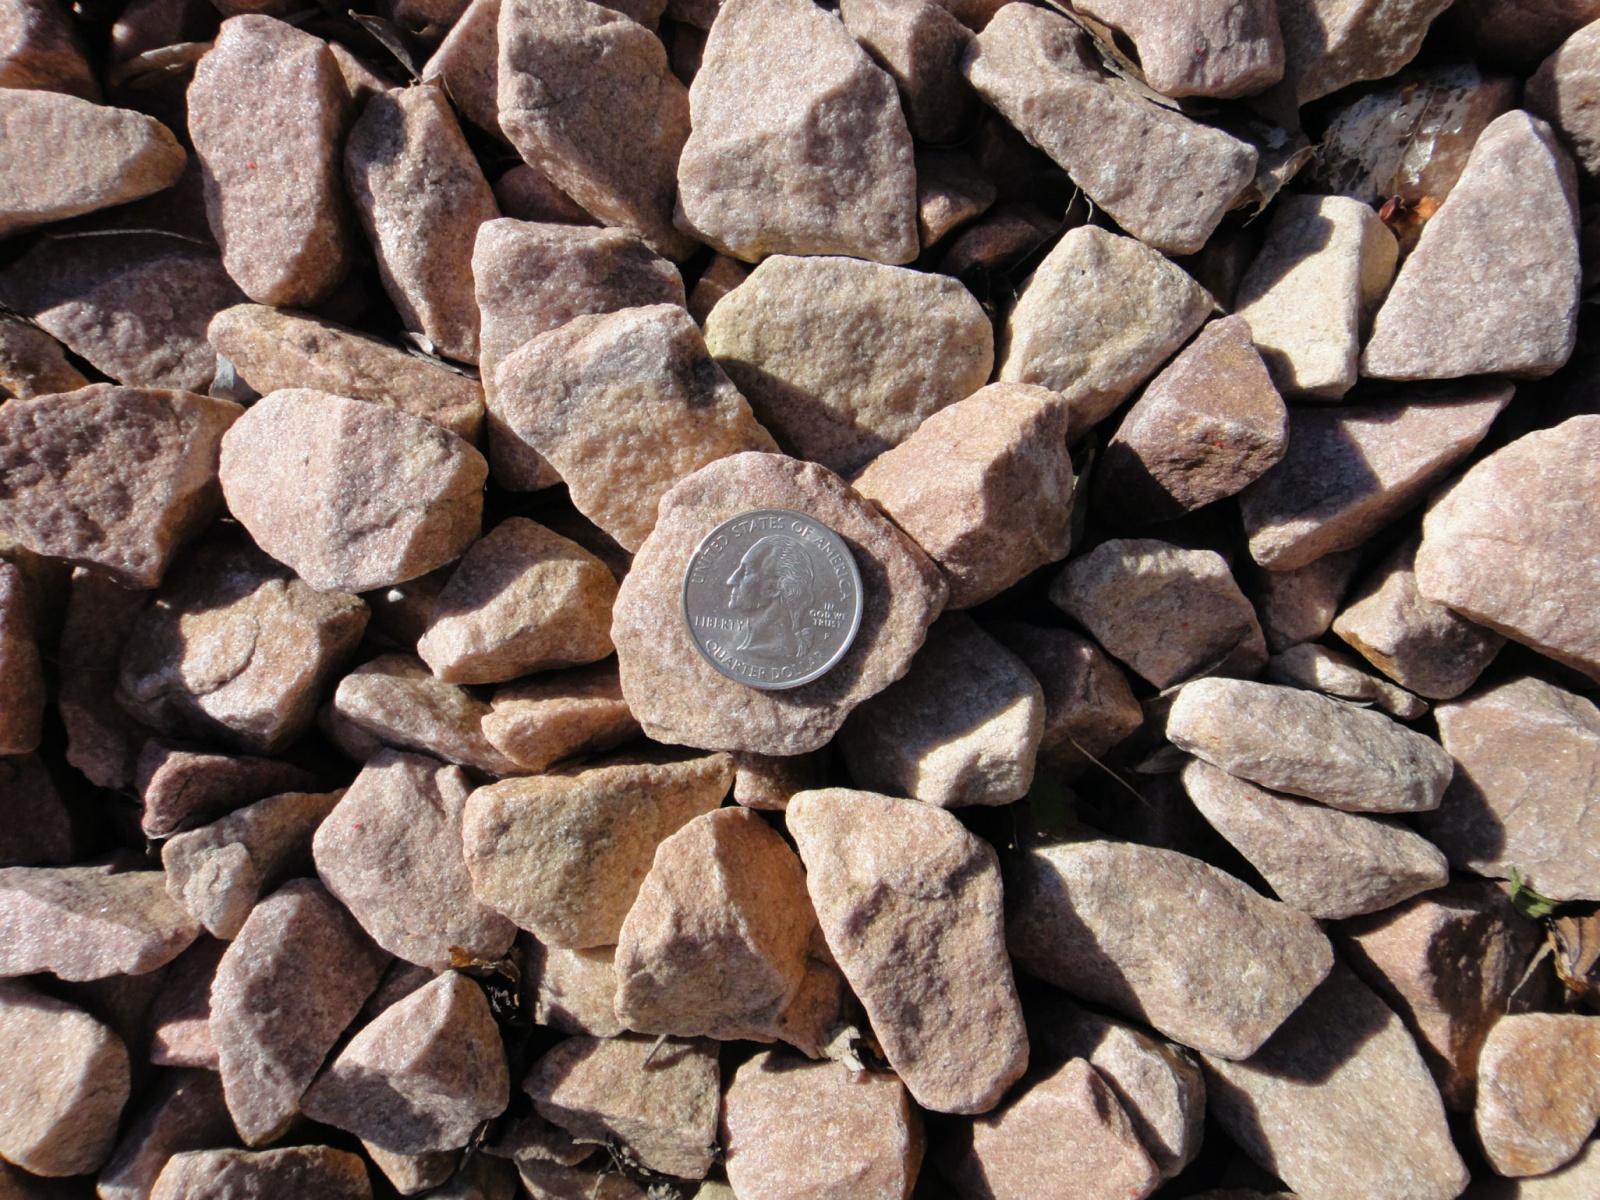 Rocky Rose Dry